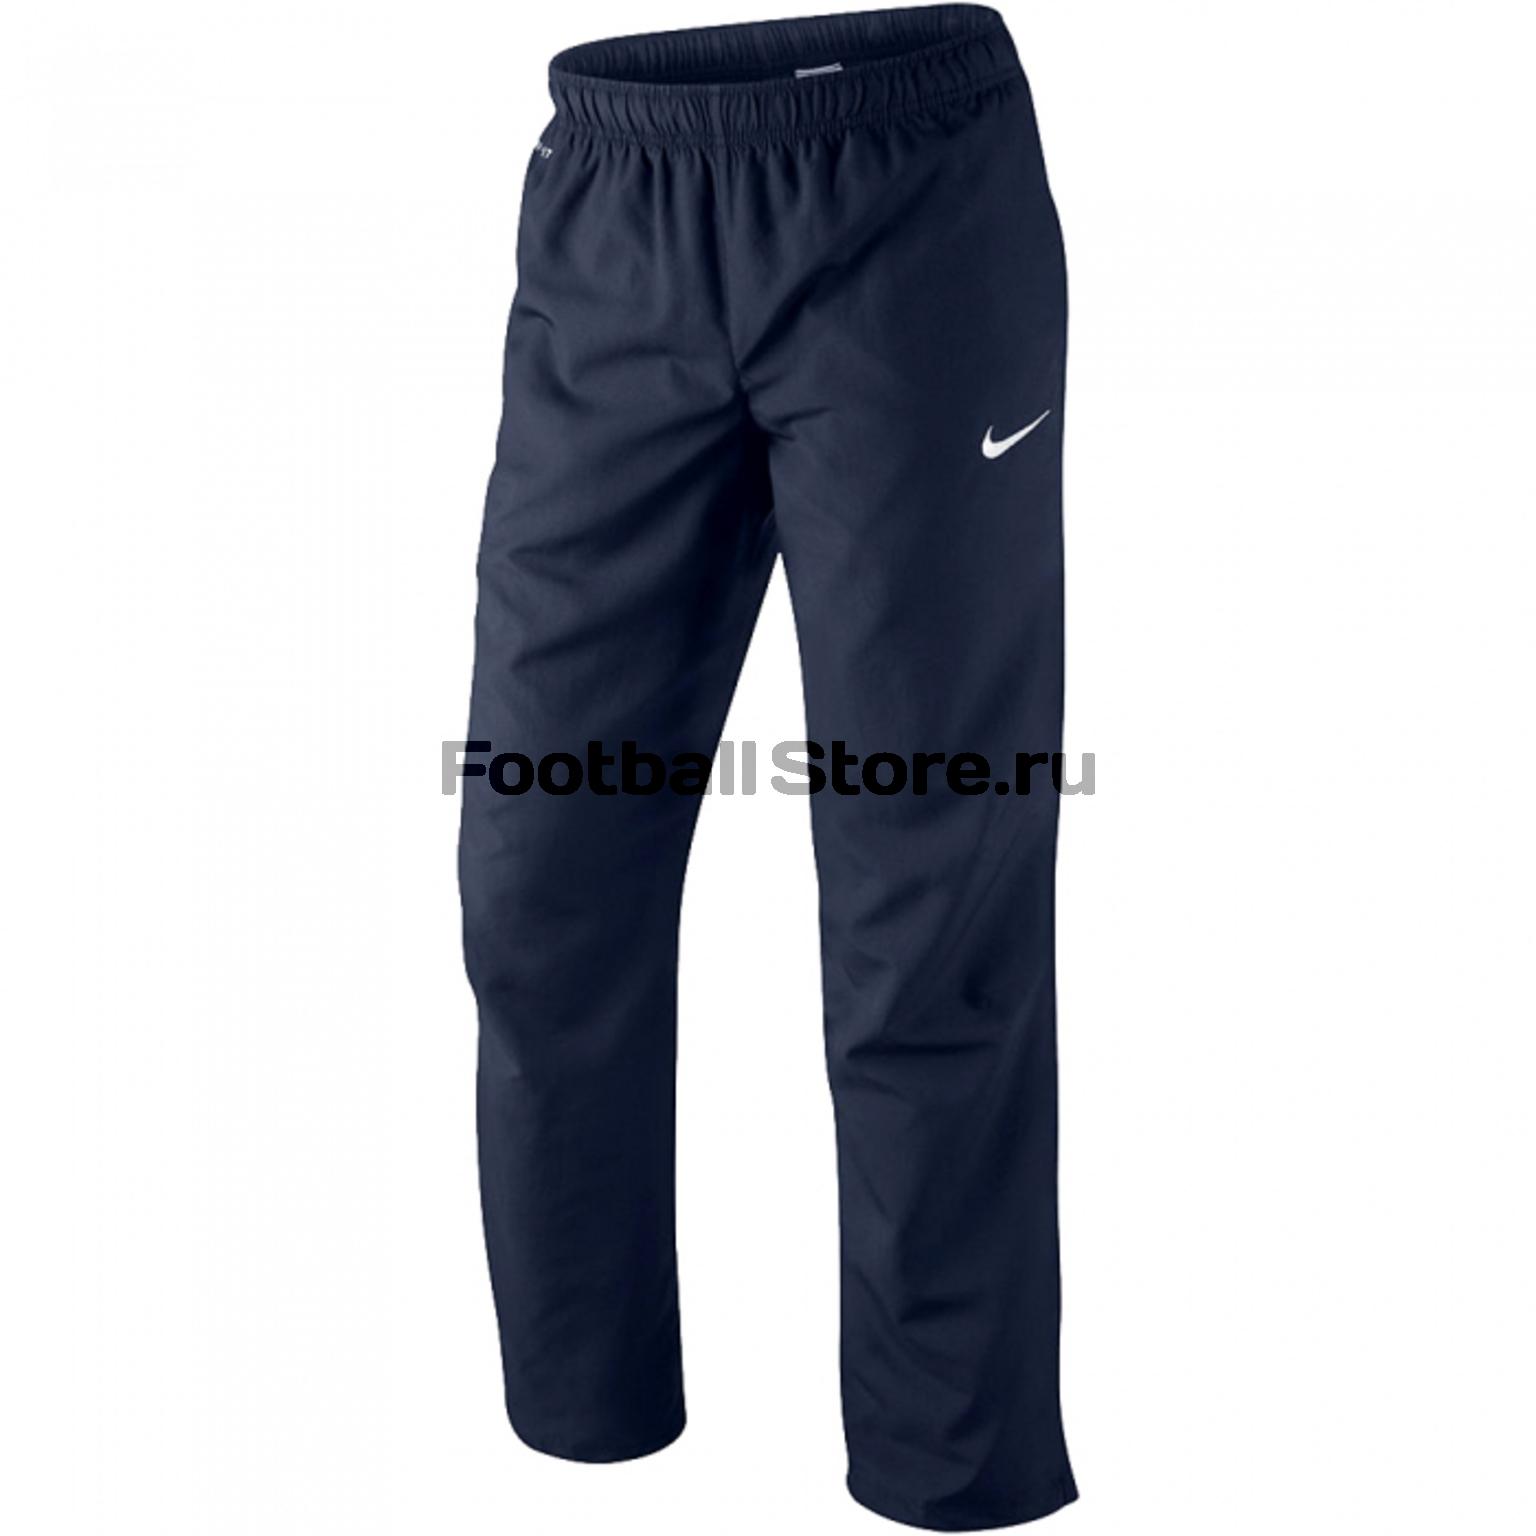 Тренировочная форма Nike Брюки для костюма Nike Boys Found 12 Sideline 447425-451